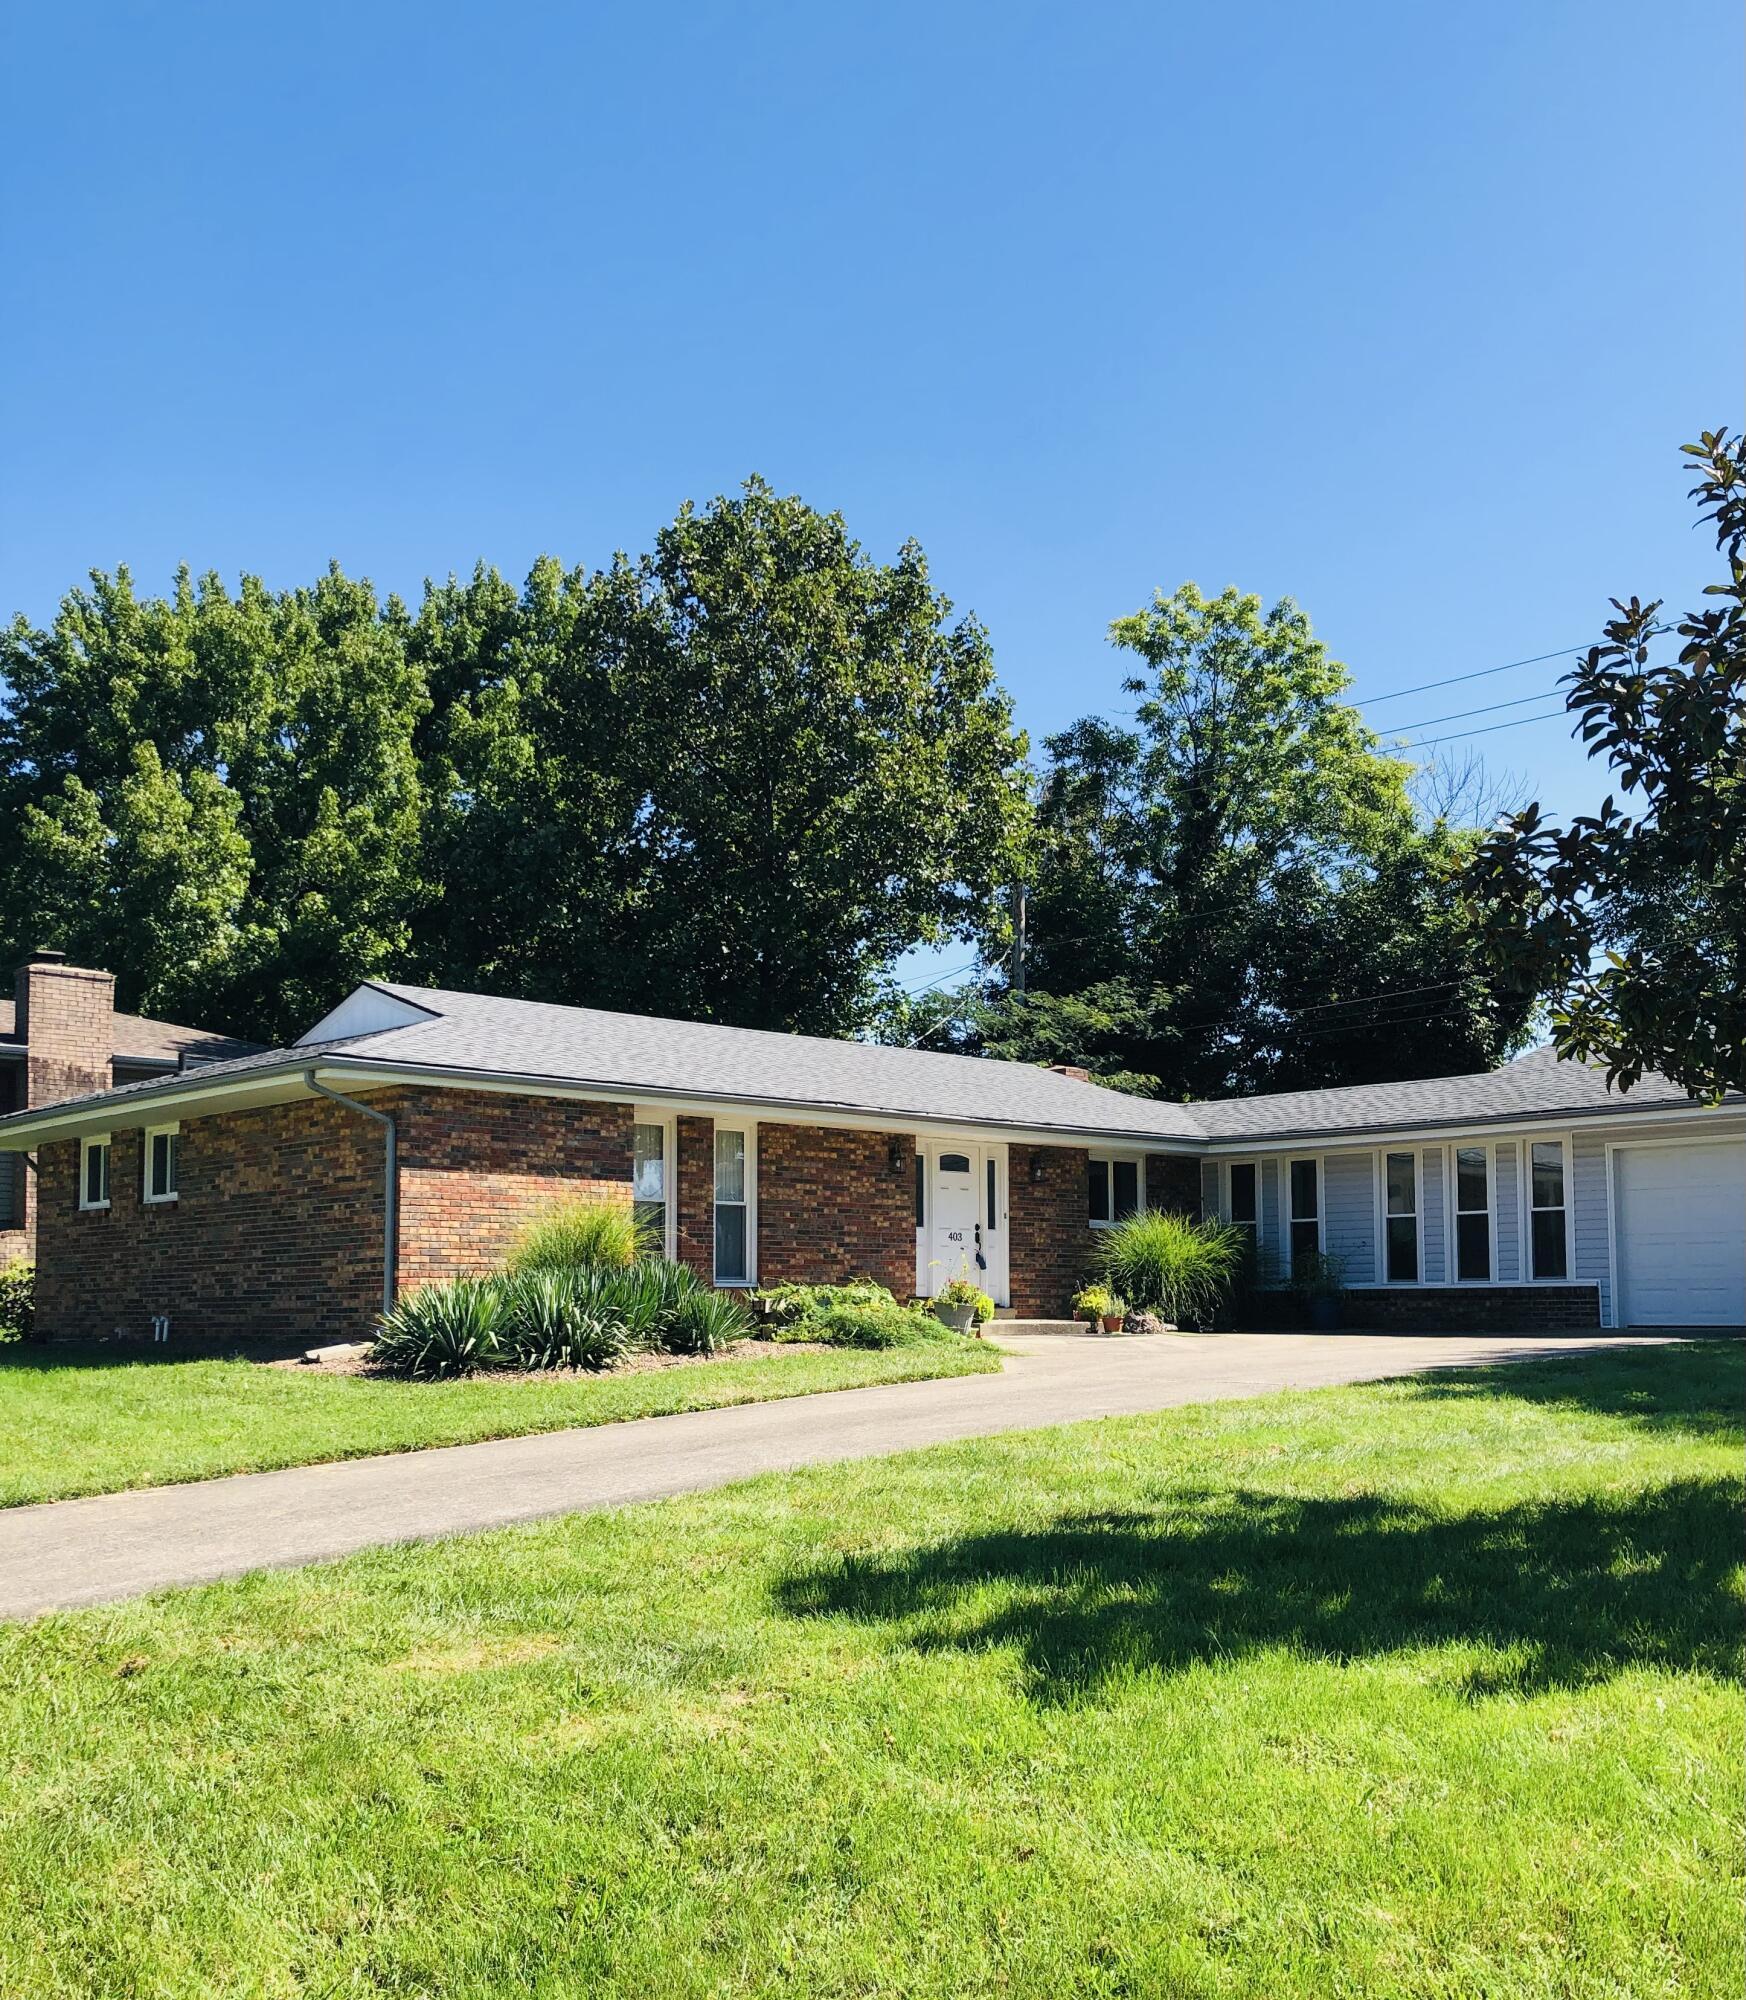 403 Westerfield Way, Lexington, KY 40503